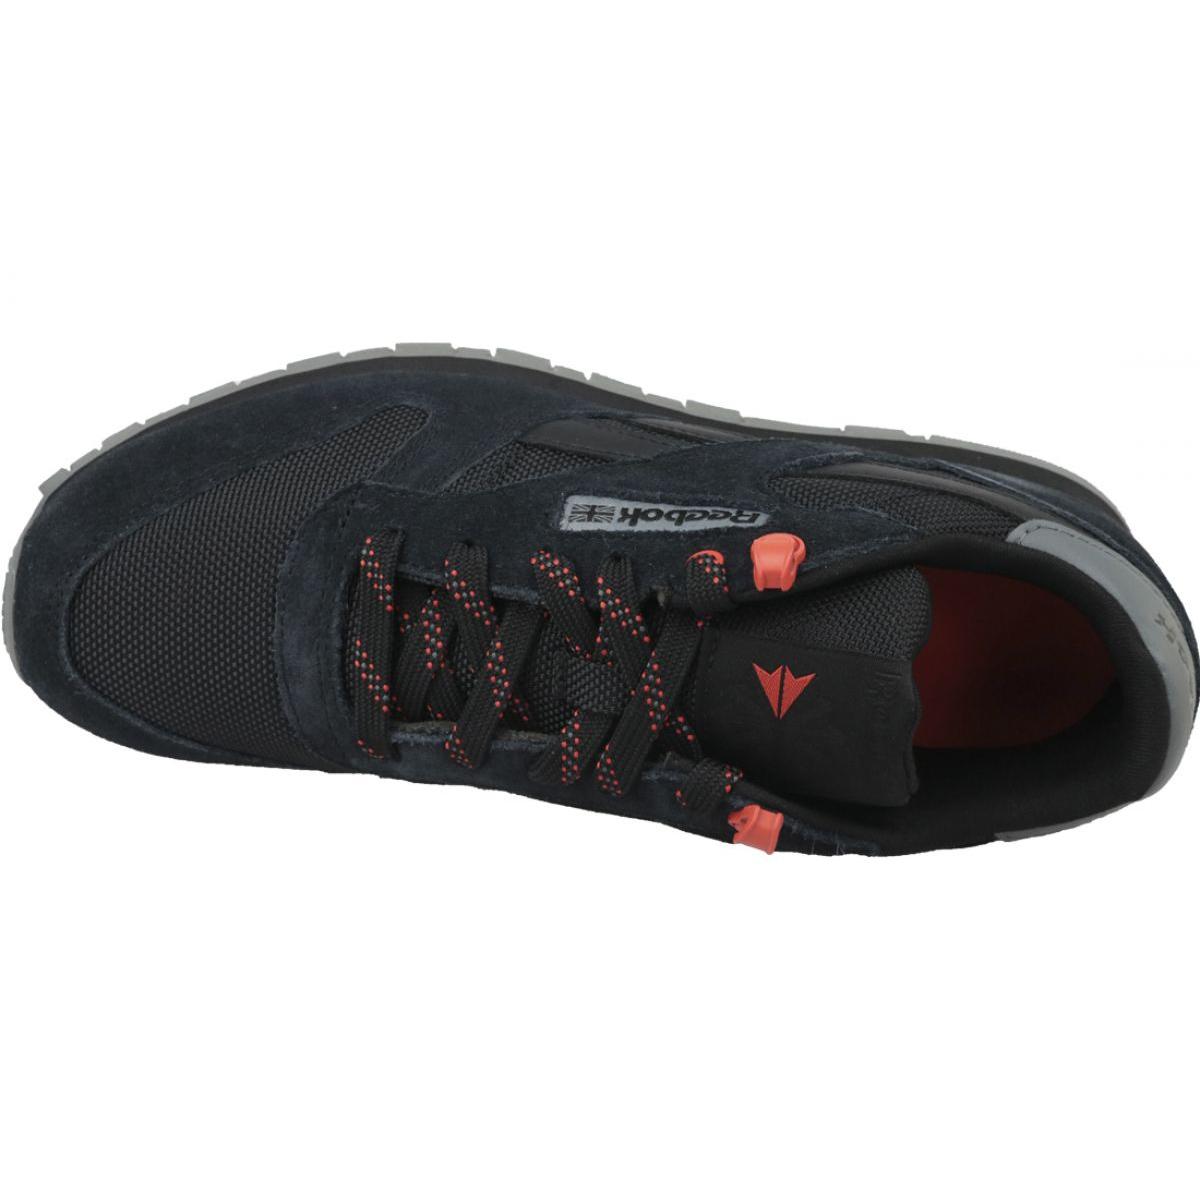 Buty Reebok Classic Leather Jr CN4705 czarne ButyModne.pl